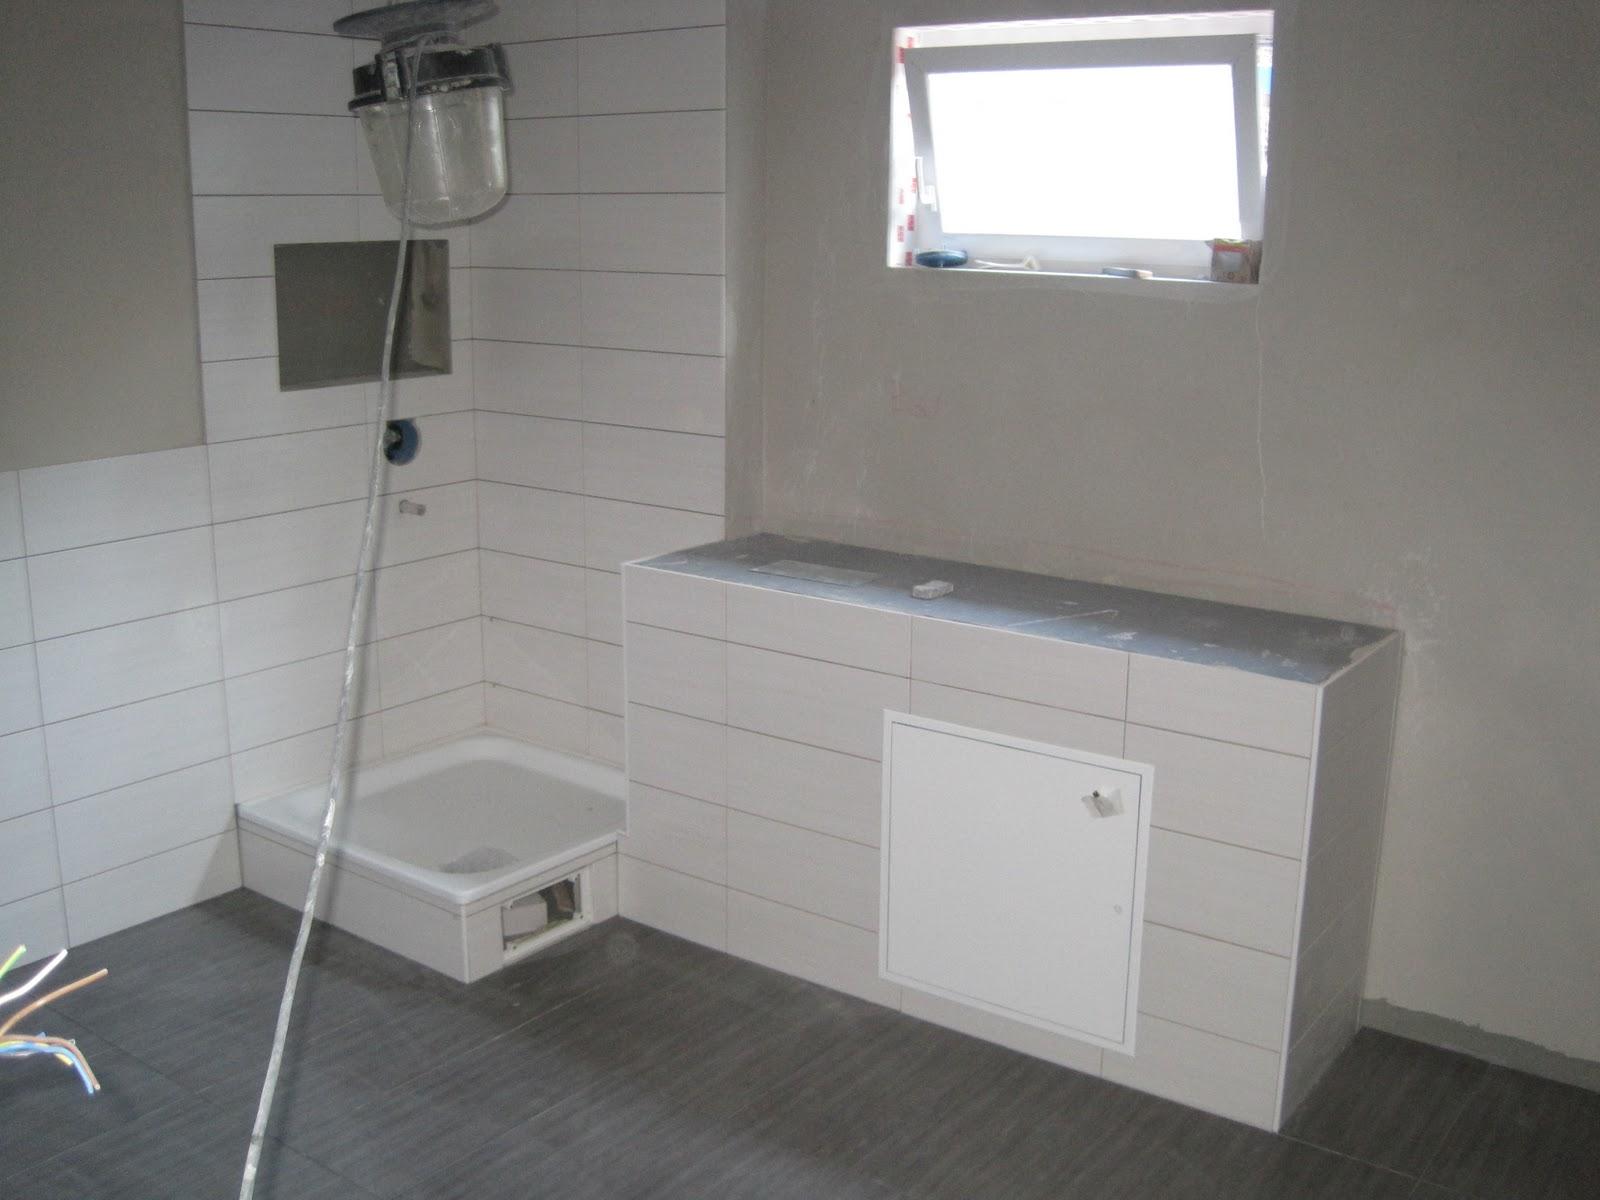 hebeanlage dusche keller fliesen sonnberg 19. Black Bedroom Furniture Sets. Home Design Ideas